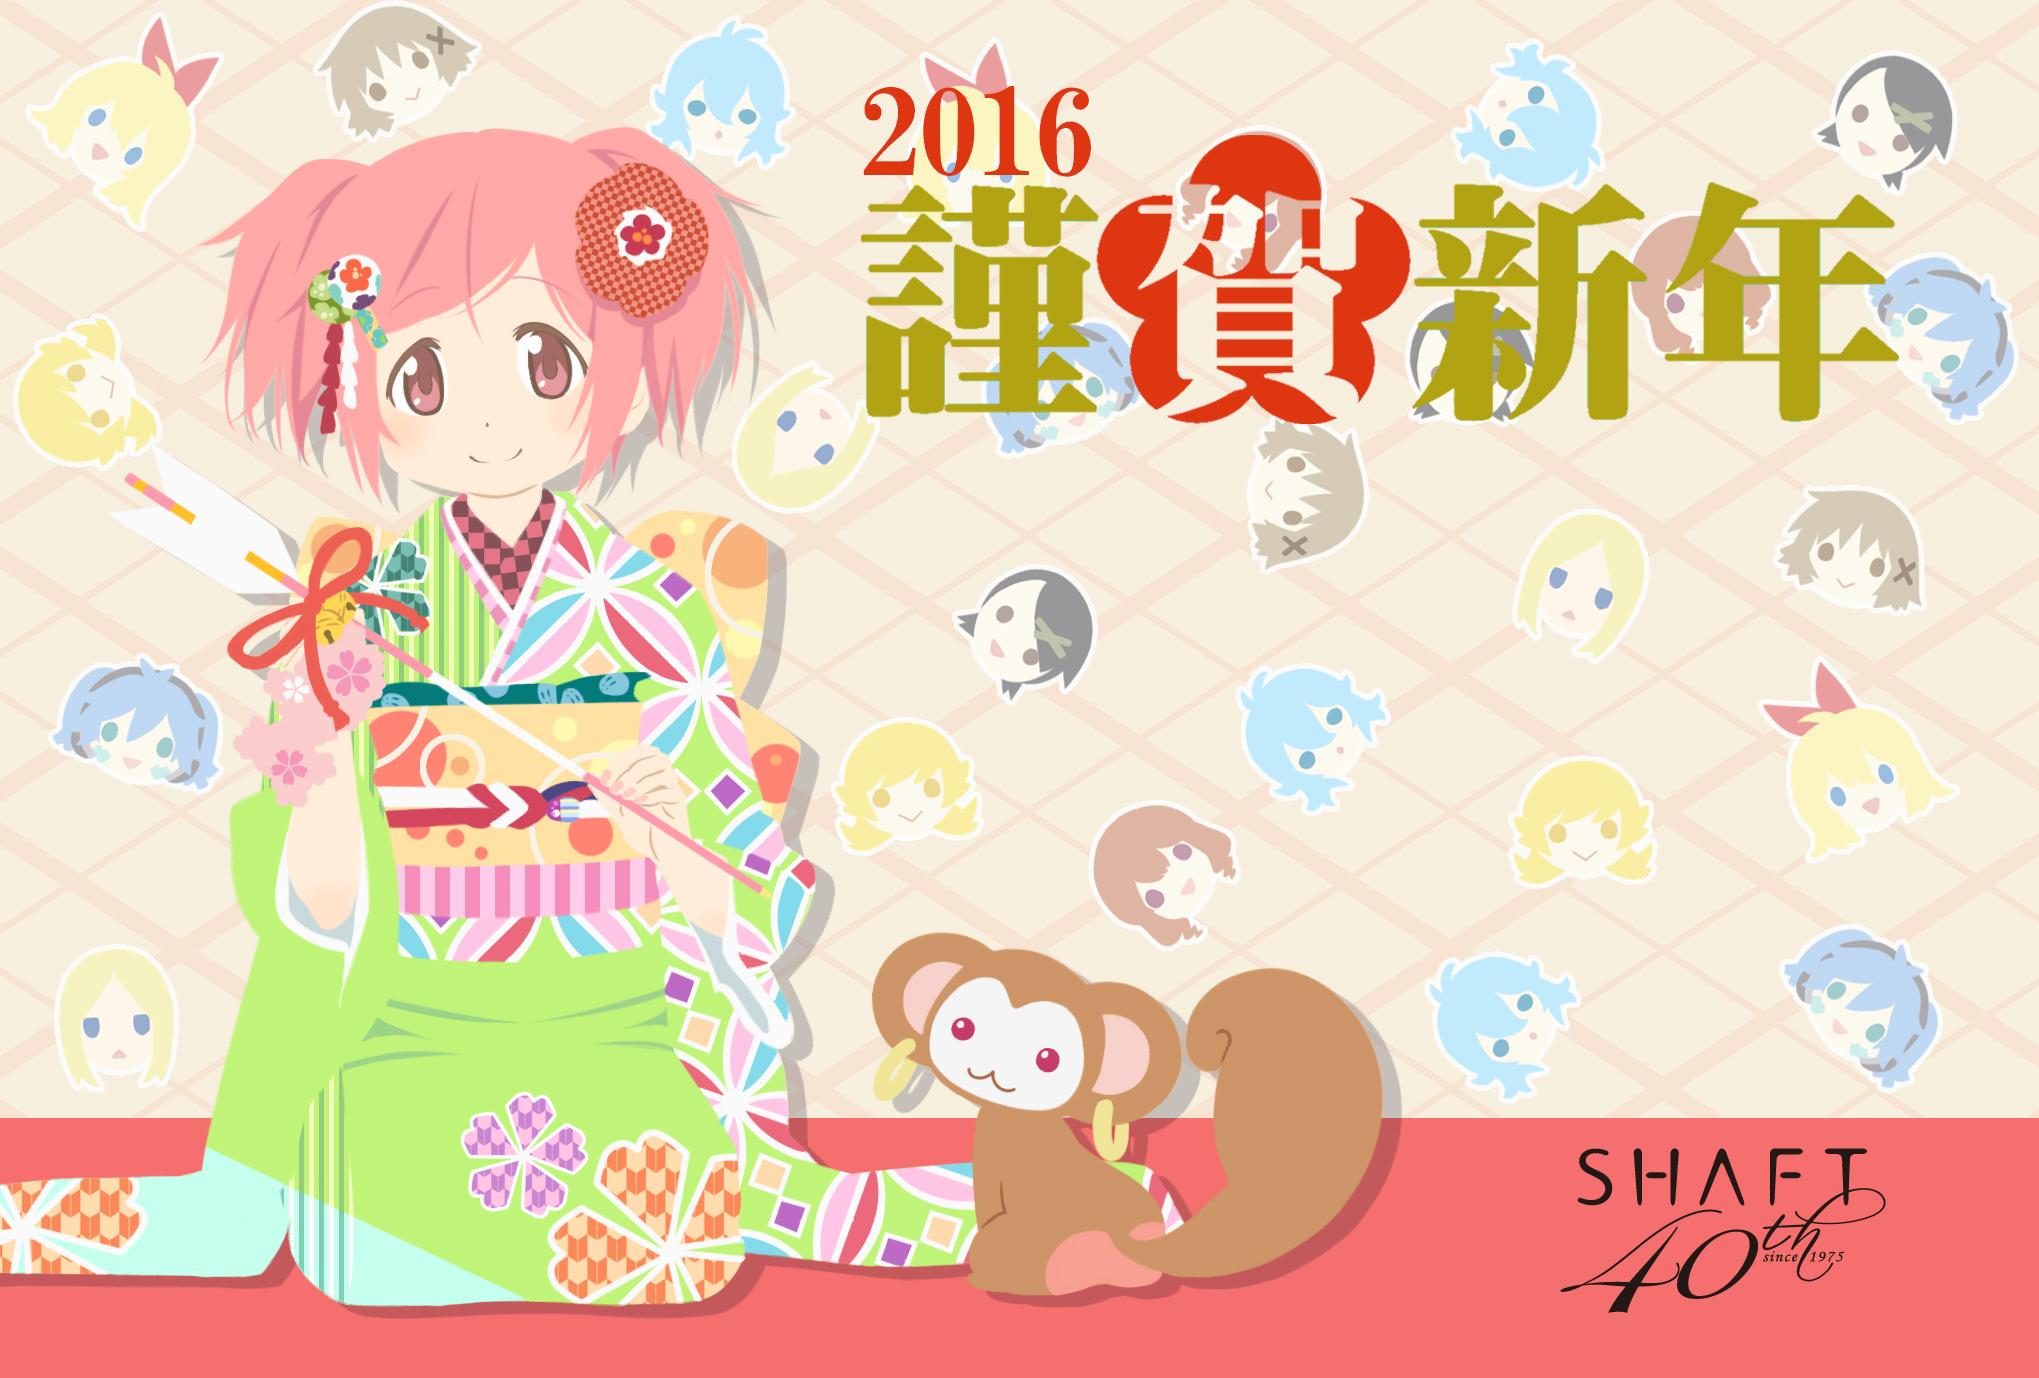 The Mahou Shoujo Madoka Magica Crew Wish You a Happy New Year